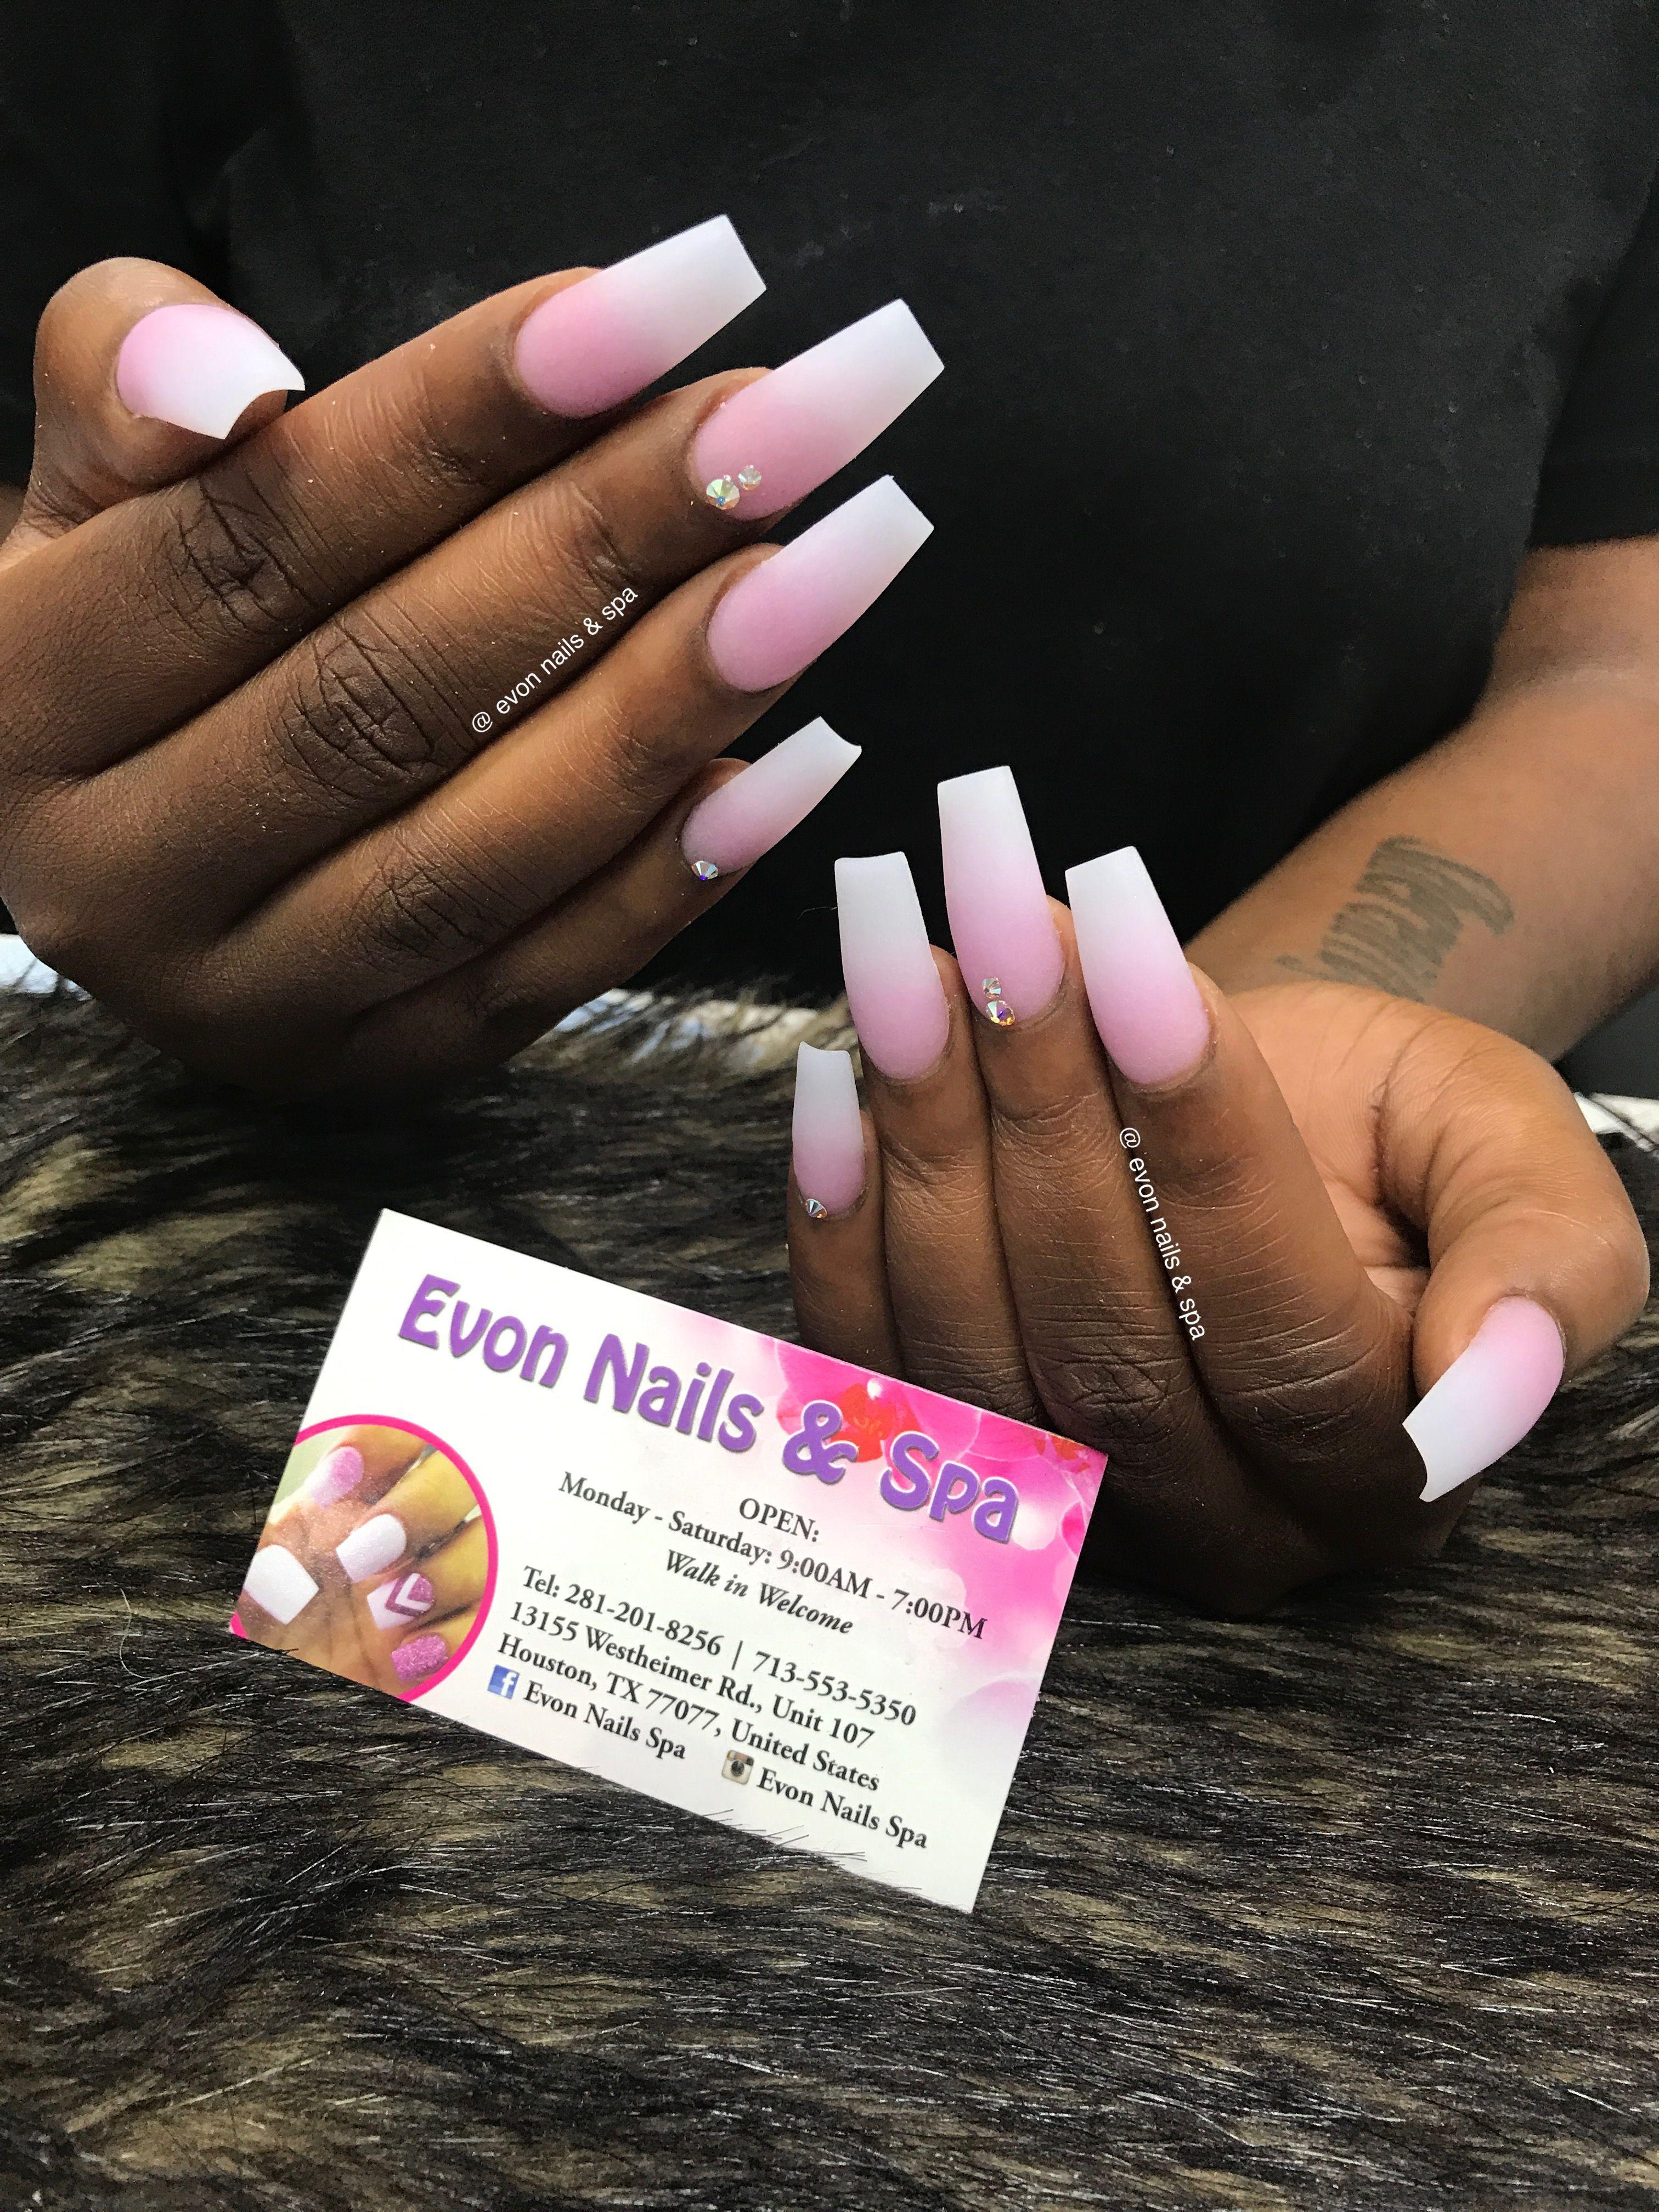 Pin By Evon Nails Spa On Evon Nails Spa Instagram Evon